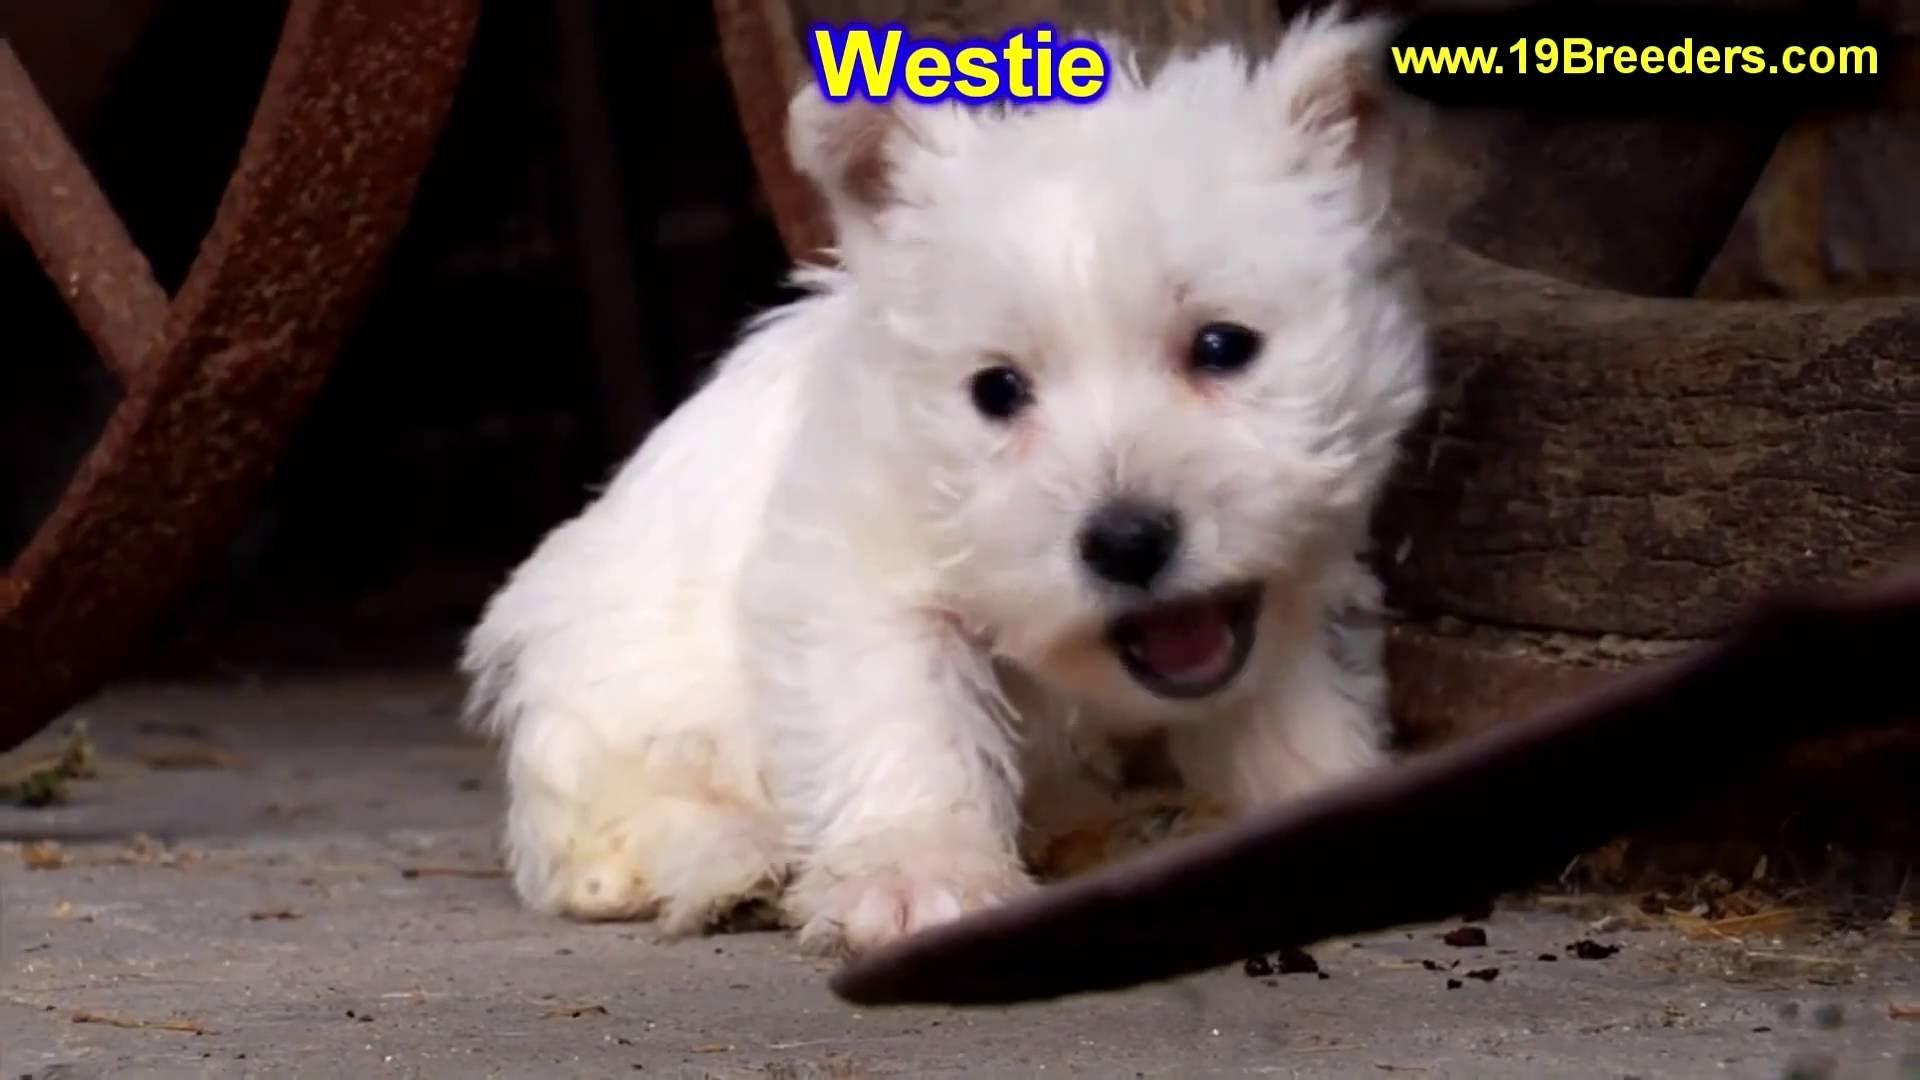 Westie Wallpaper ① Wallpapertag